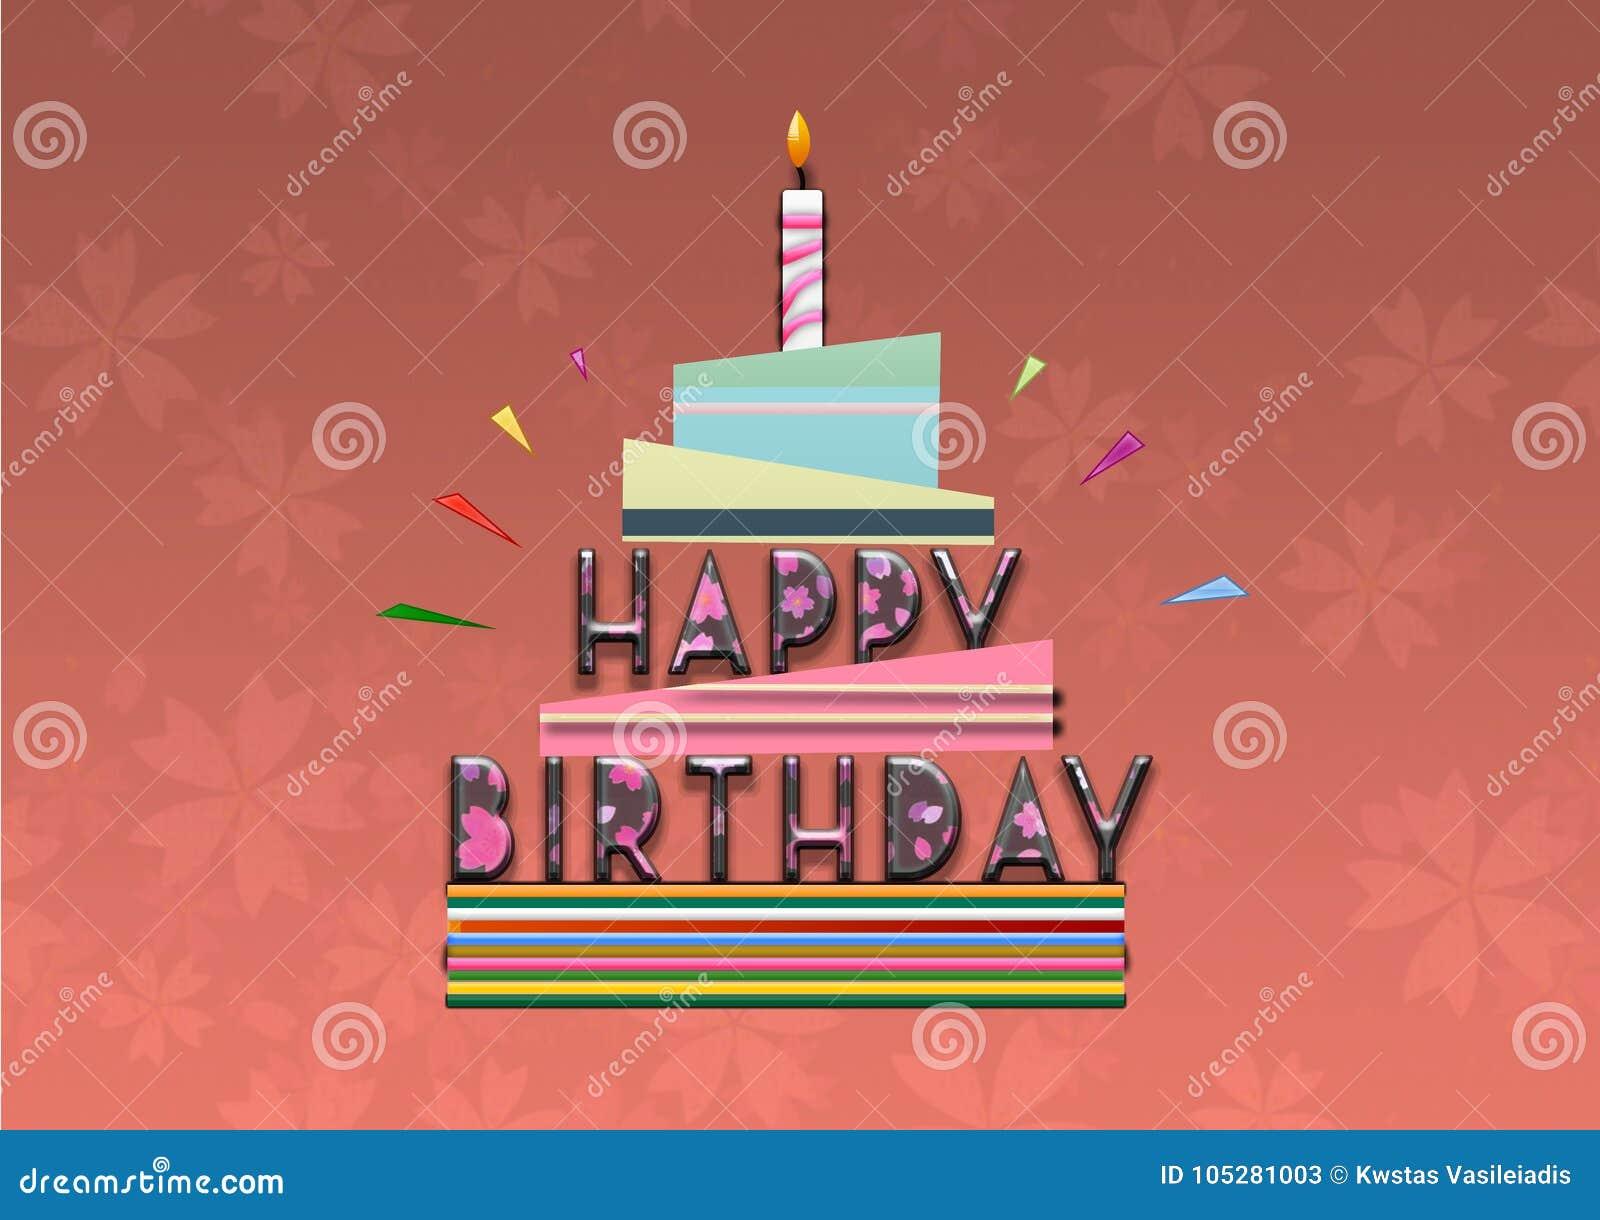 Happy Birthday Cake Illustration Card